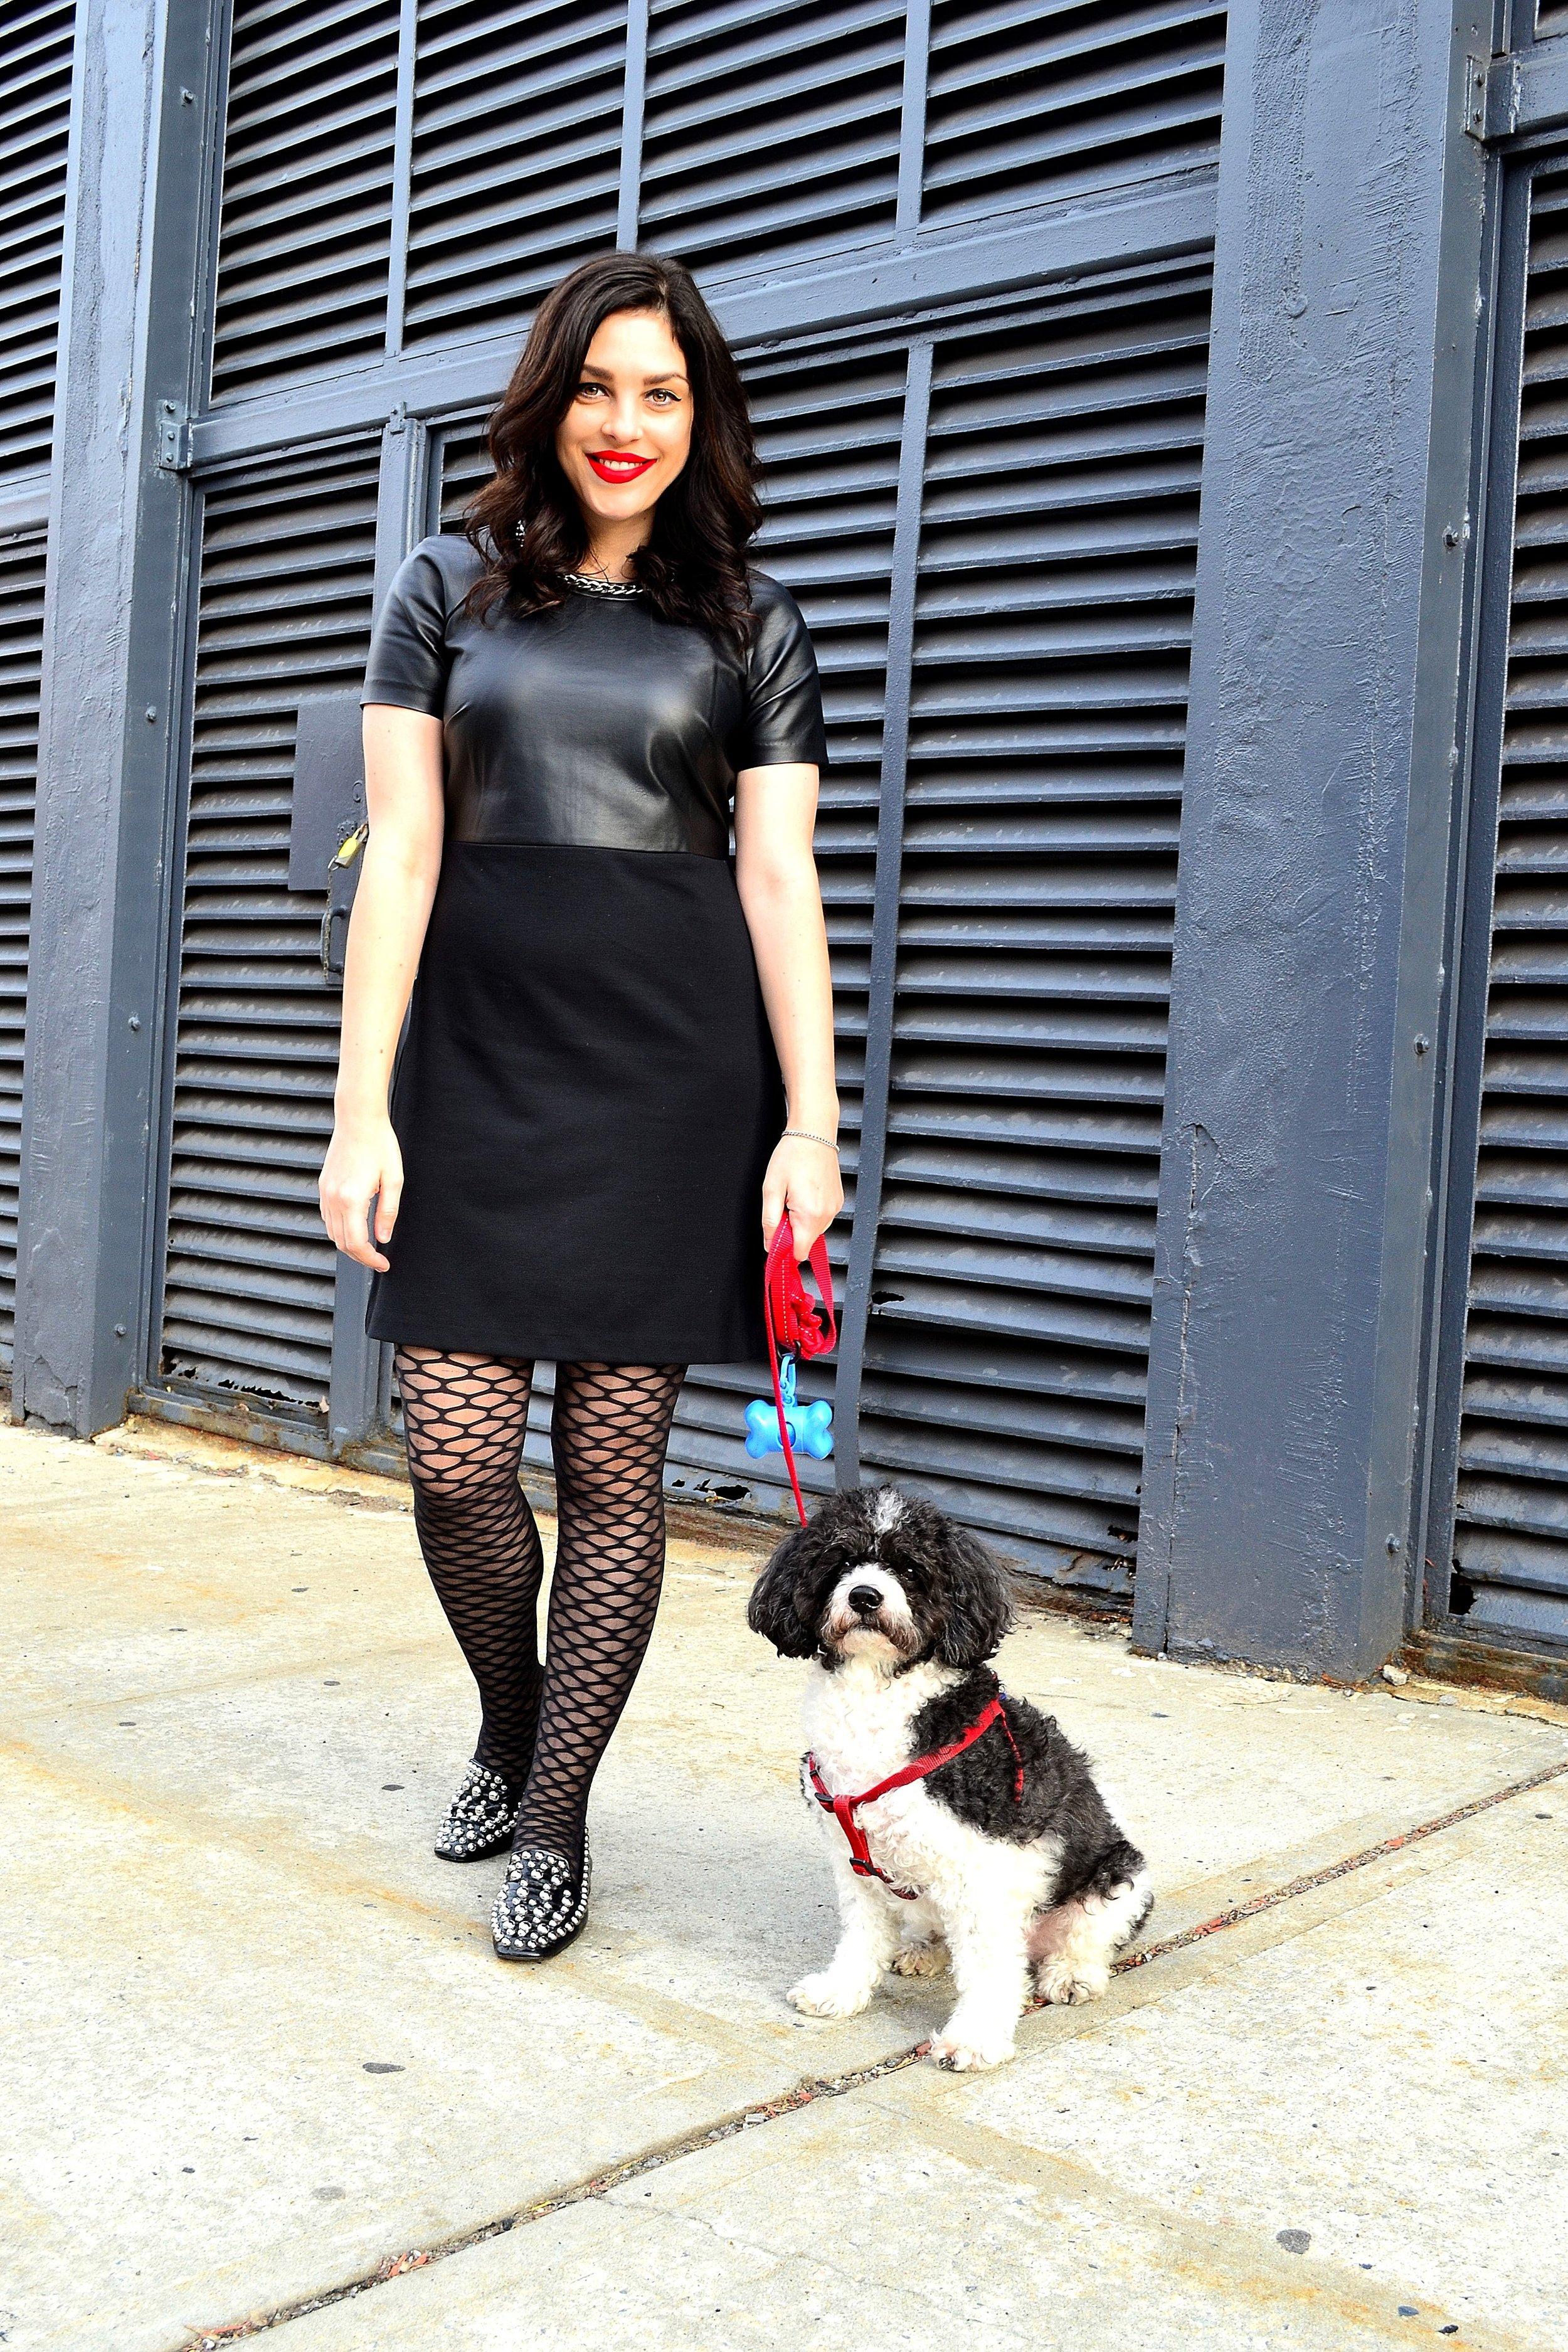 dress- Michael Kors, tights- Express, studded loafers- Zara